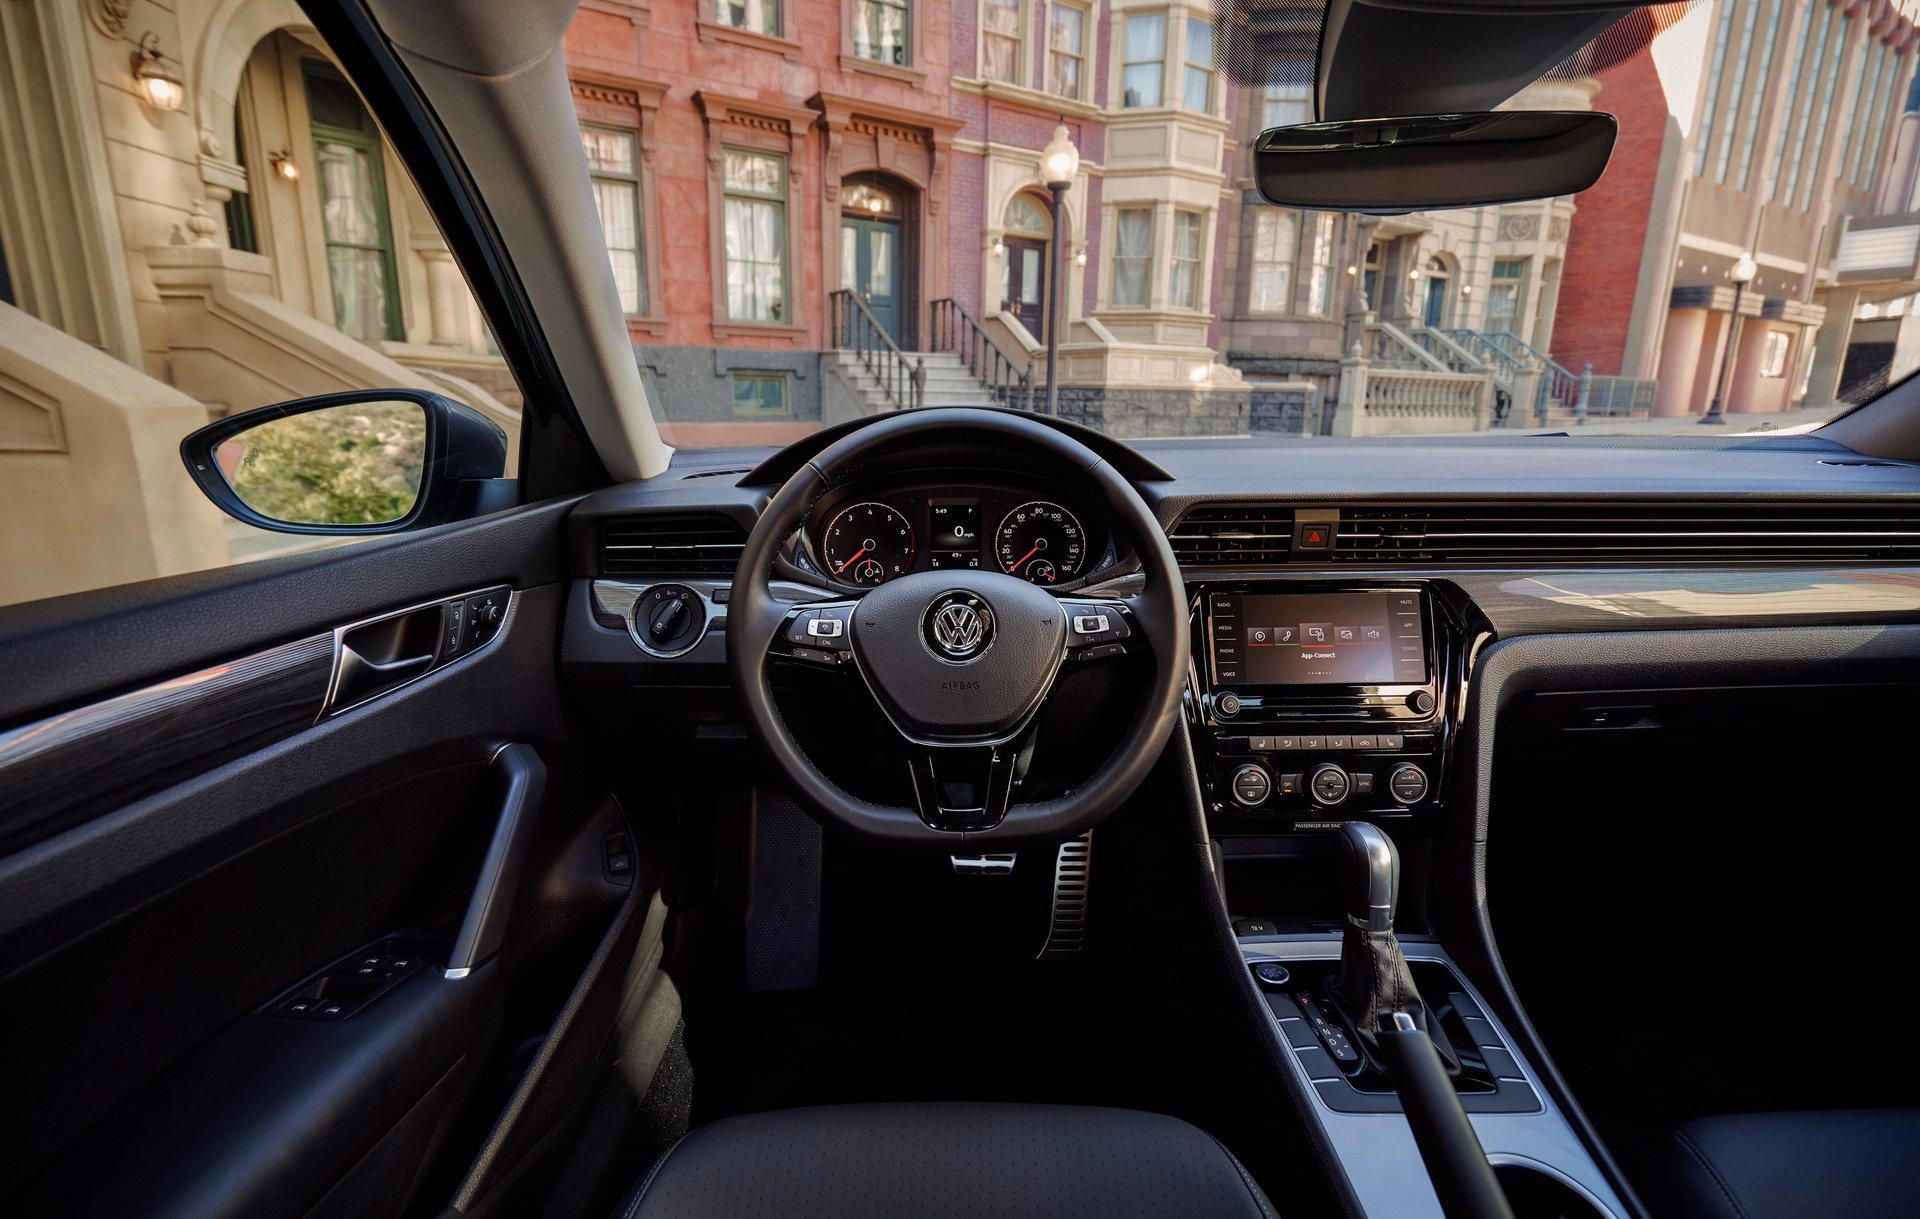 2020-vw-passat-usa-volkswagen-2.jpeg